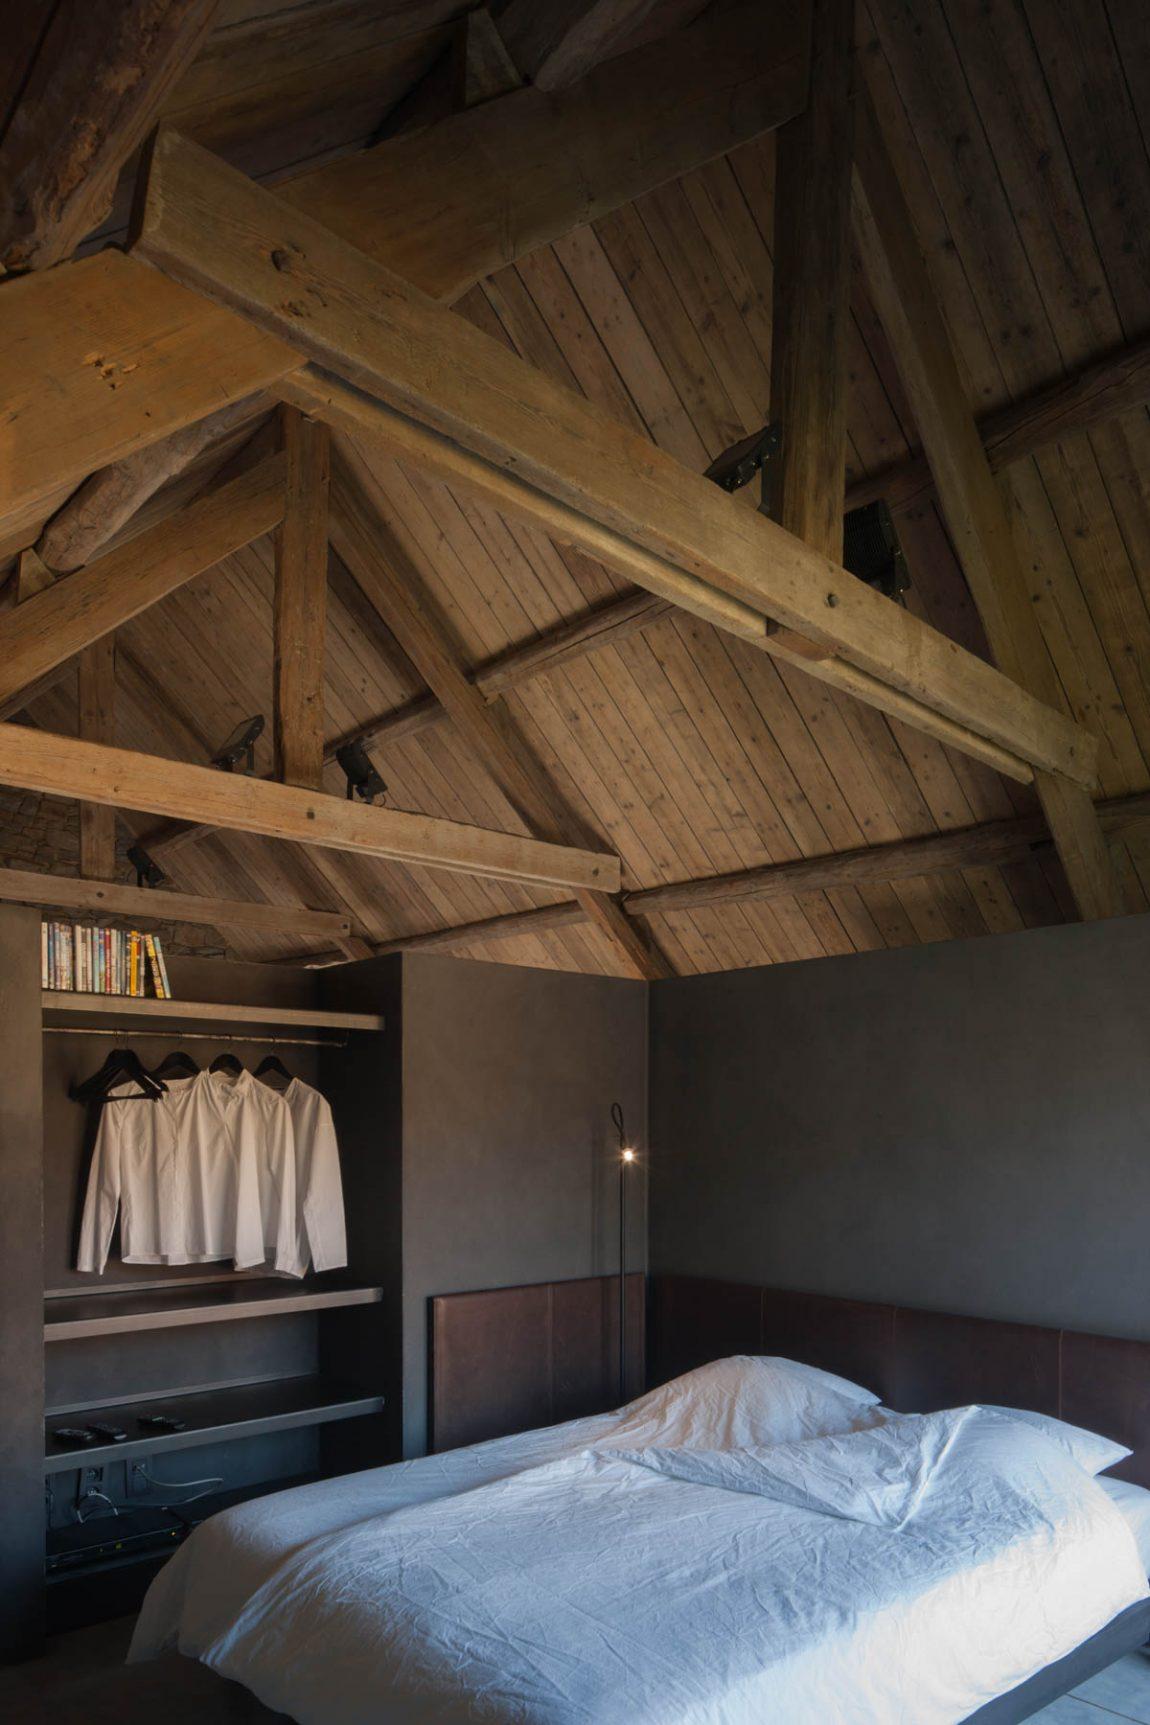 Stoere rustieke slaapkamer van La Micheline